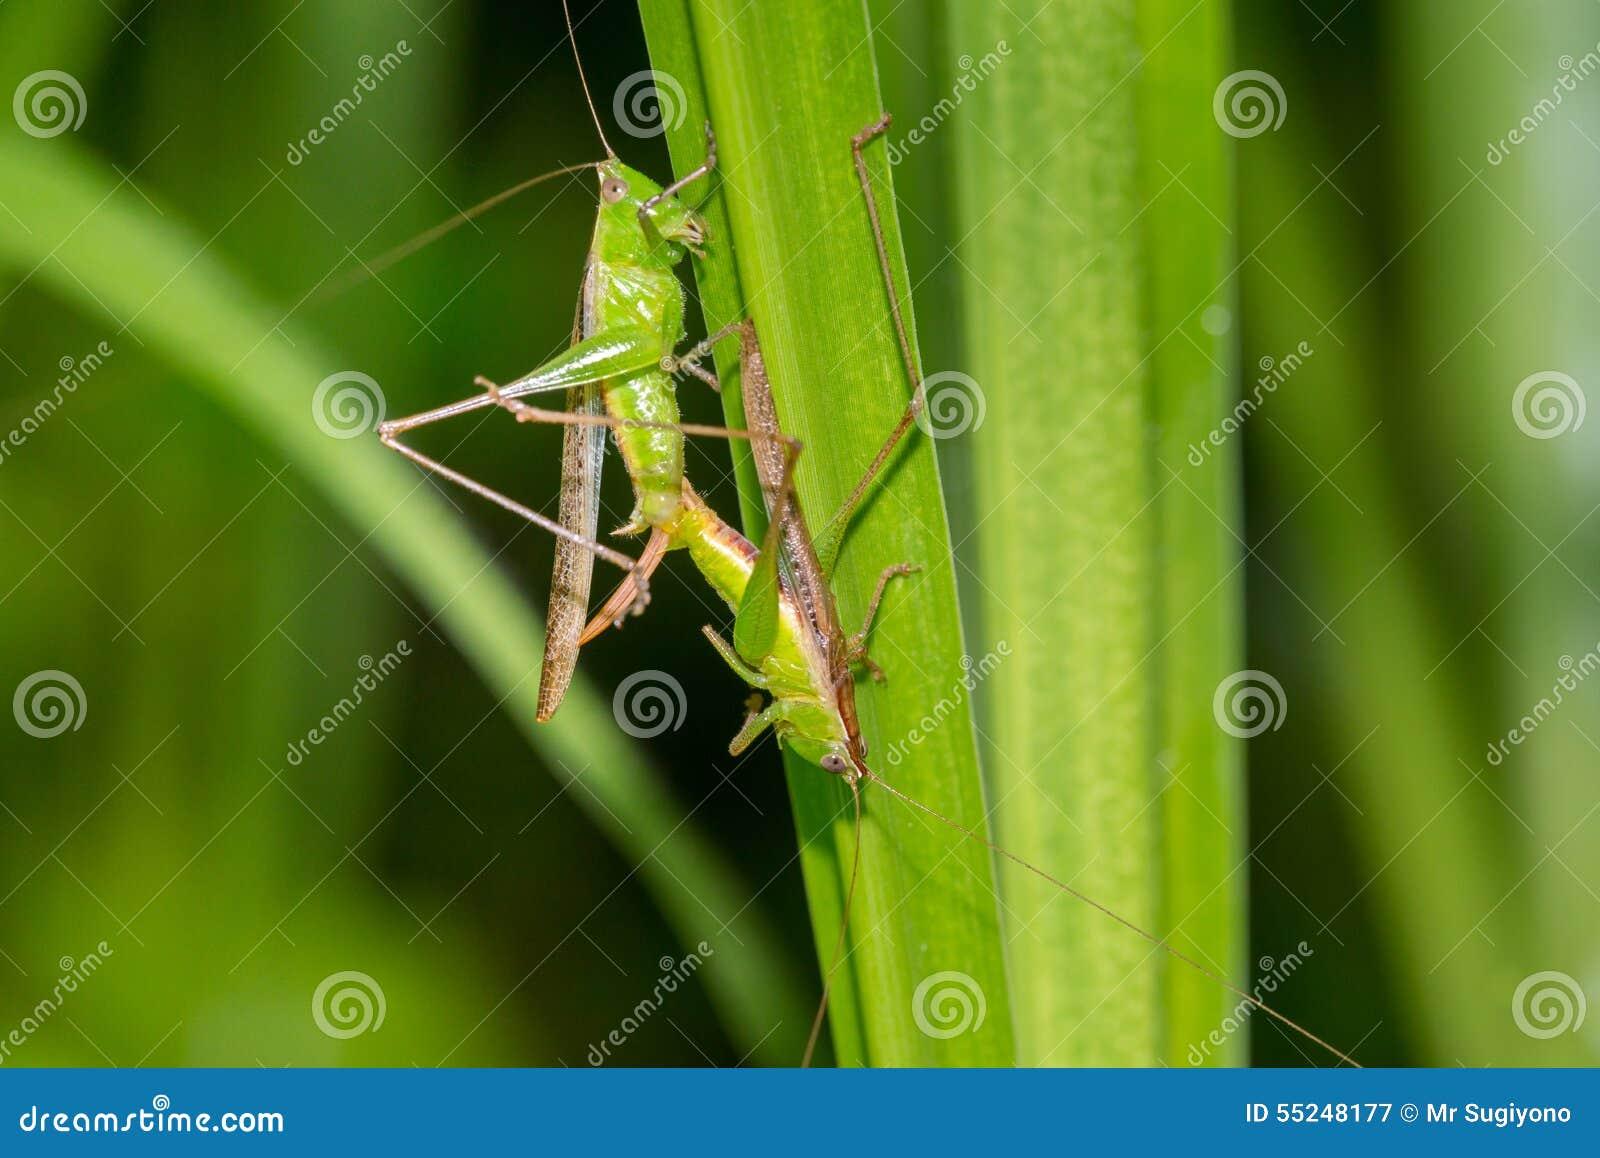 Green Grasshopper mating stock image. Image of macro - 55248177